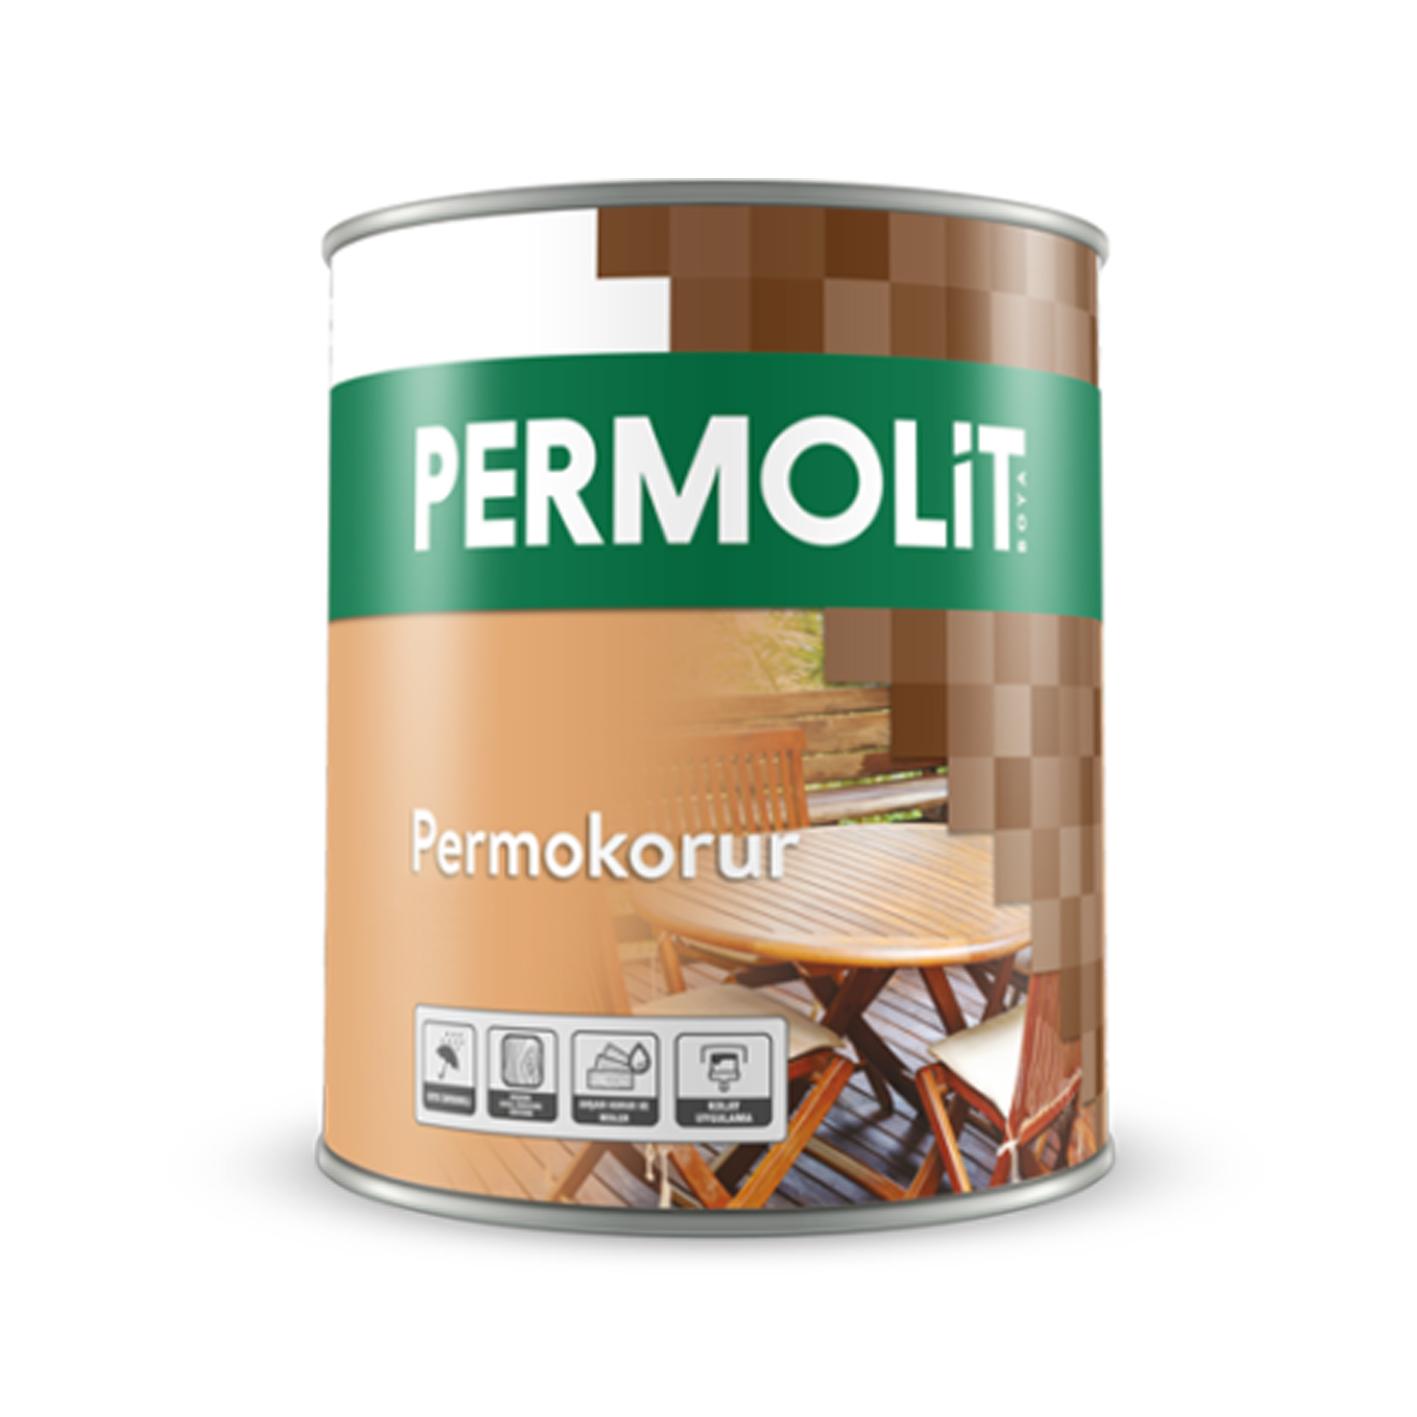 Permolit Permokorur Tik Yağı 2.5Lt